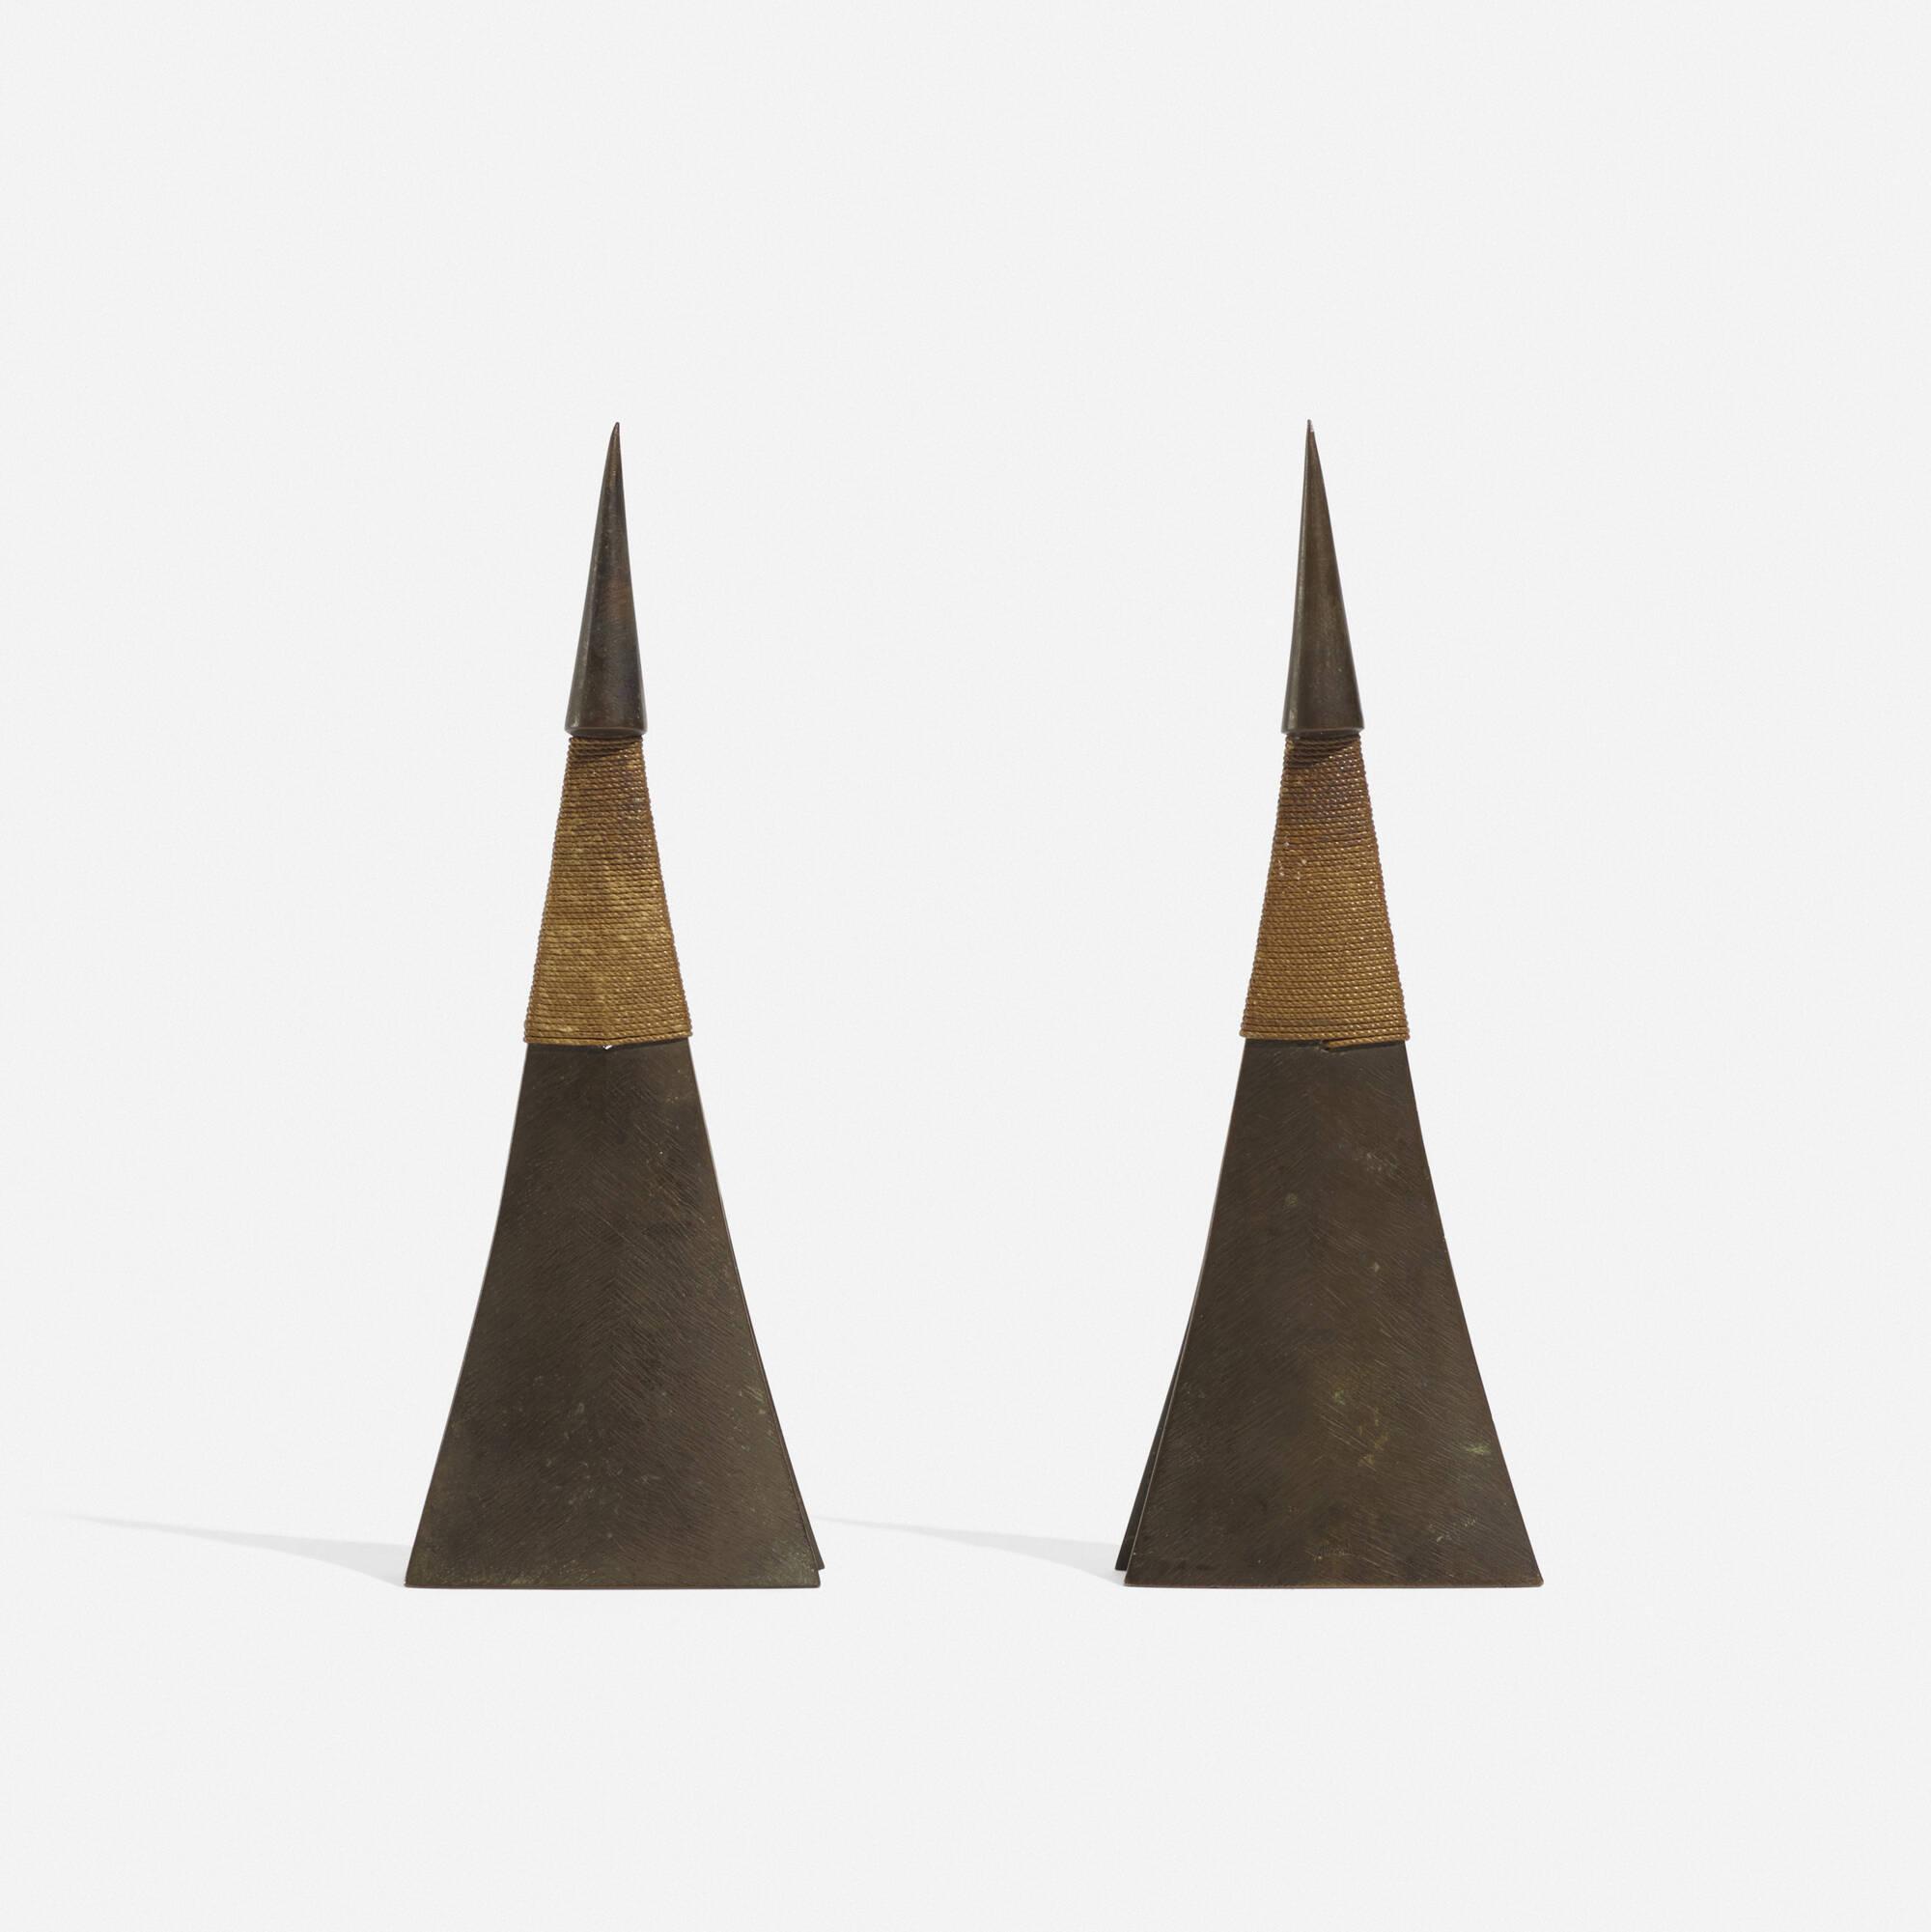 260: Carl Auböck II / rare candlesticks model 3502, pair (2 of 3)